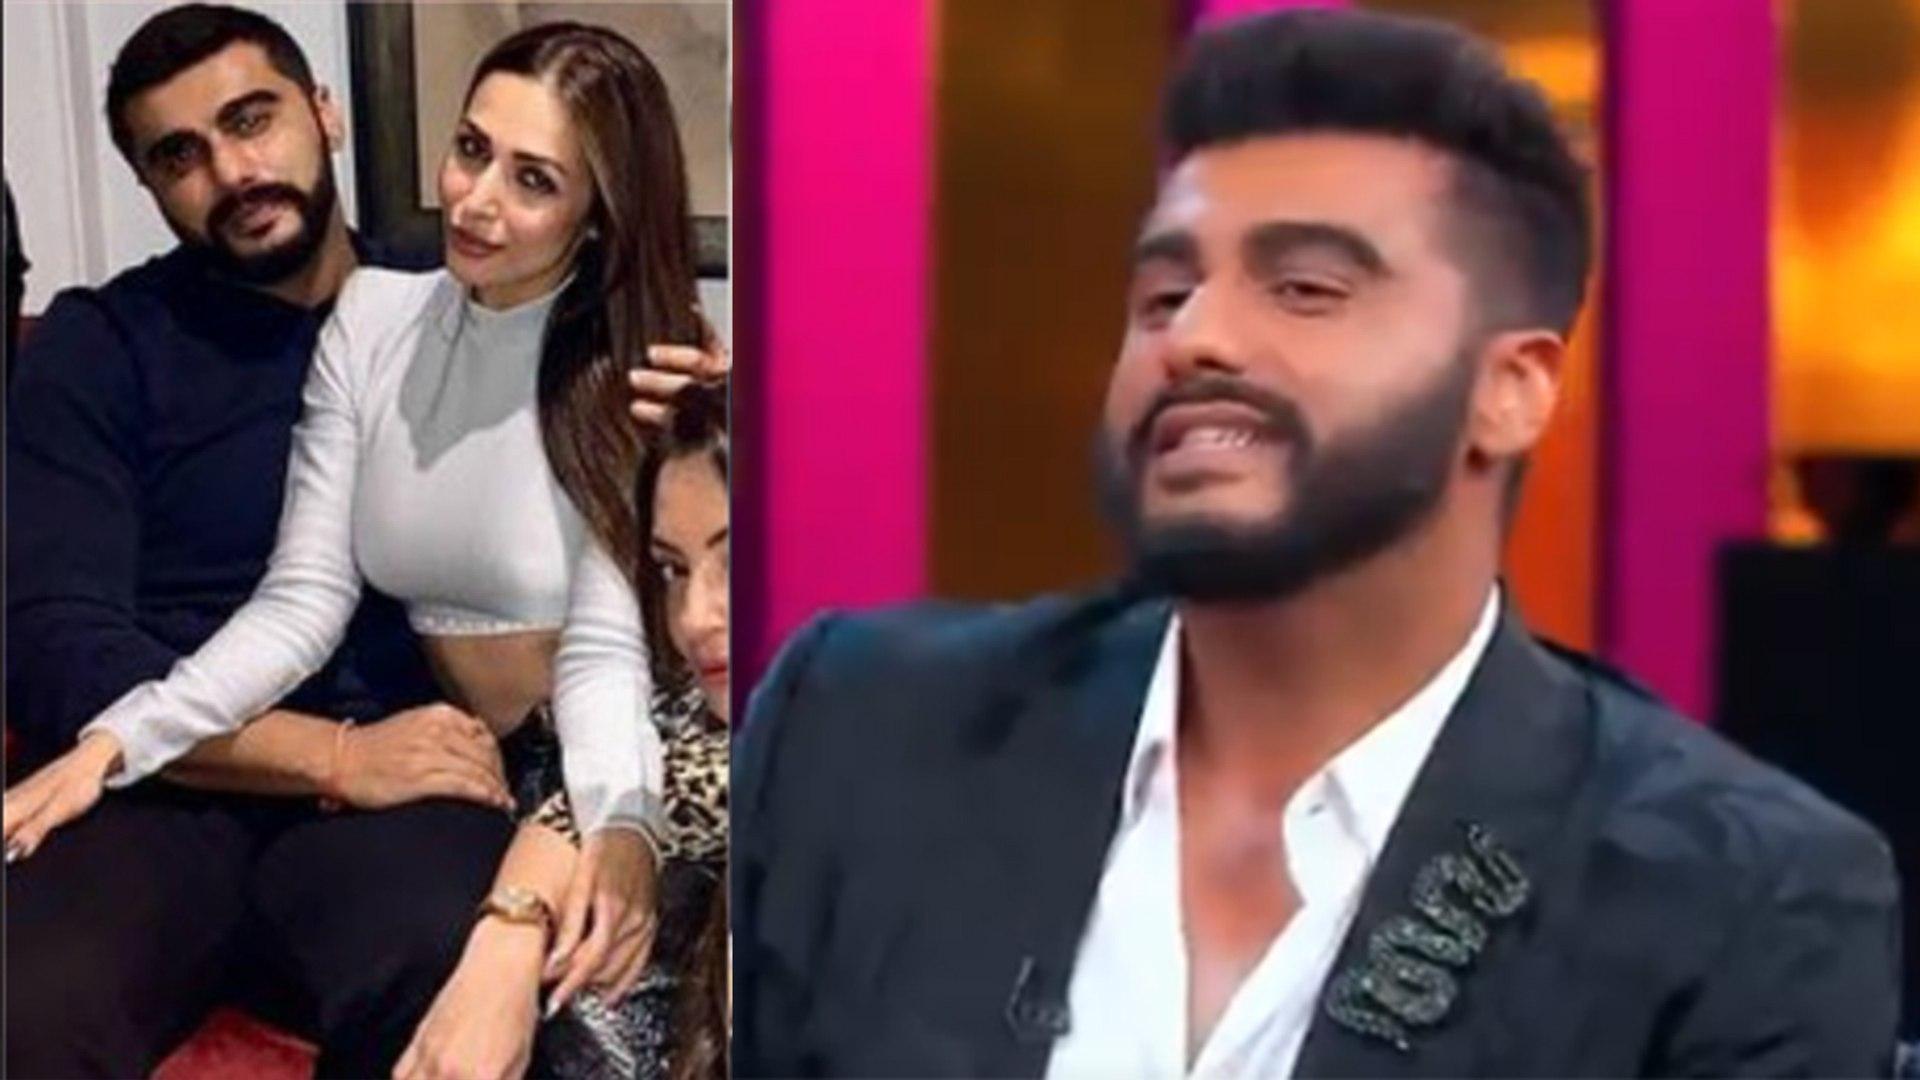 Arjun Kapoor reveals he is DATING Malaika Arora Khan in Koffee With Karan season 6 | FilmiBeat